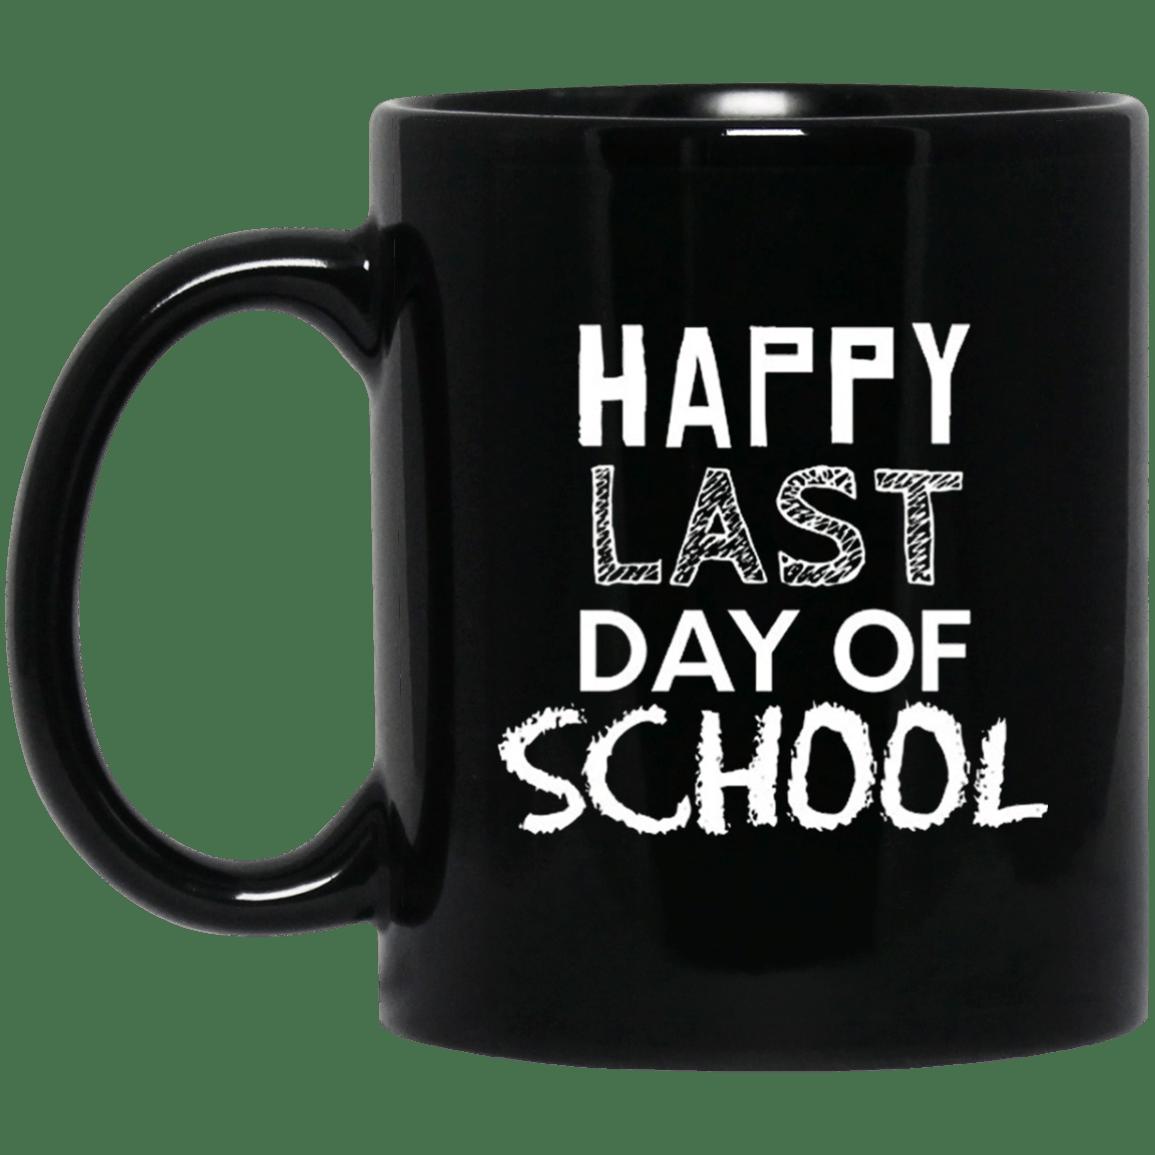 Happy last day of school teacher gift idea student mug